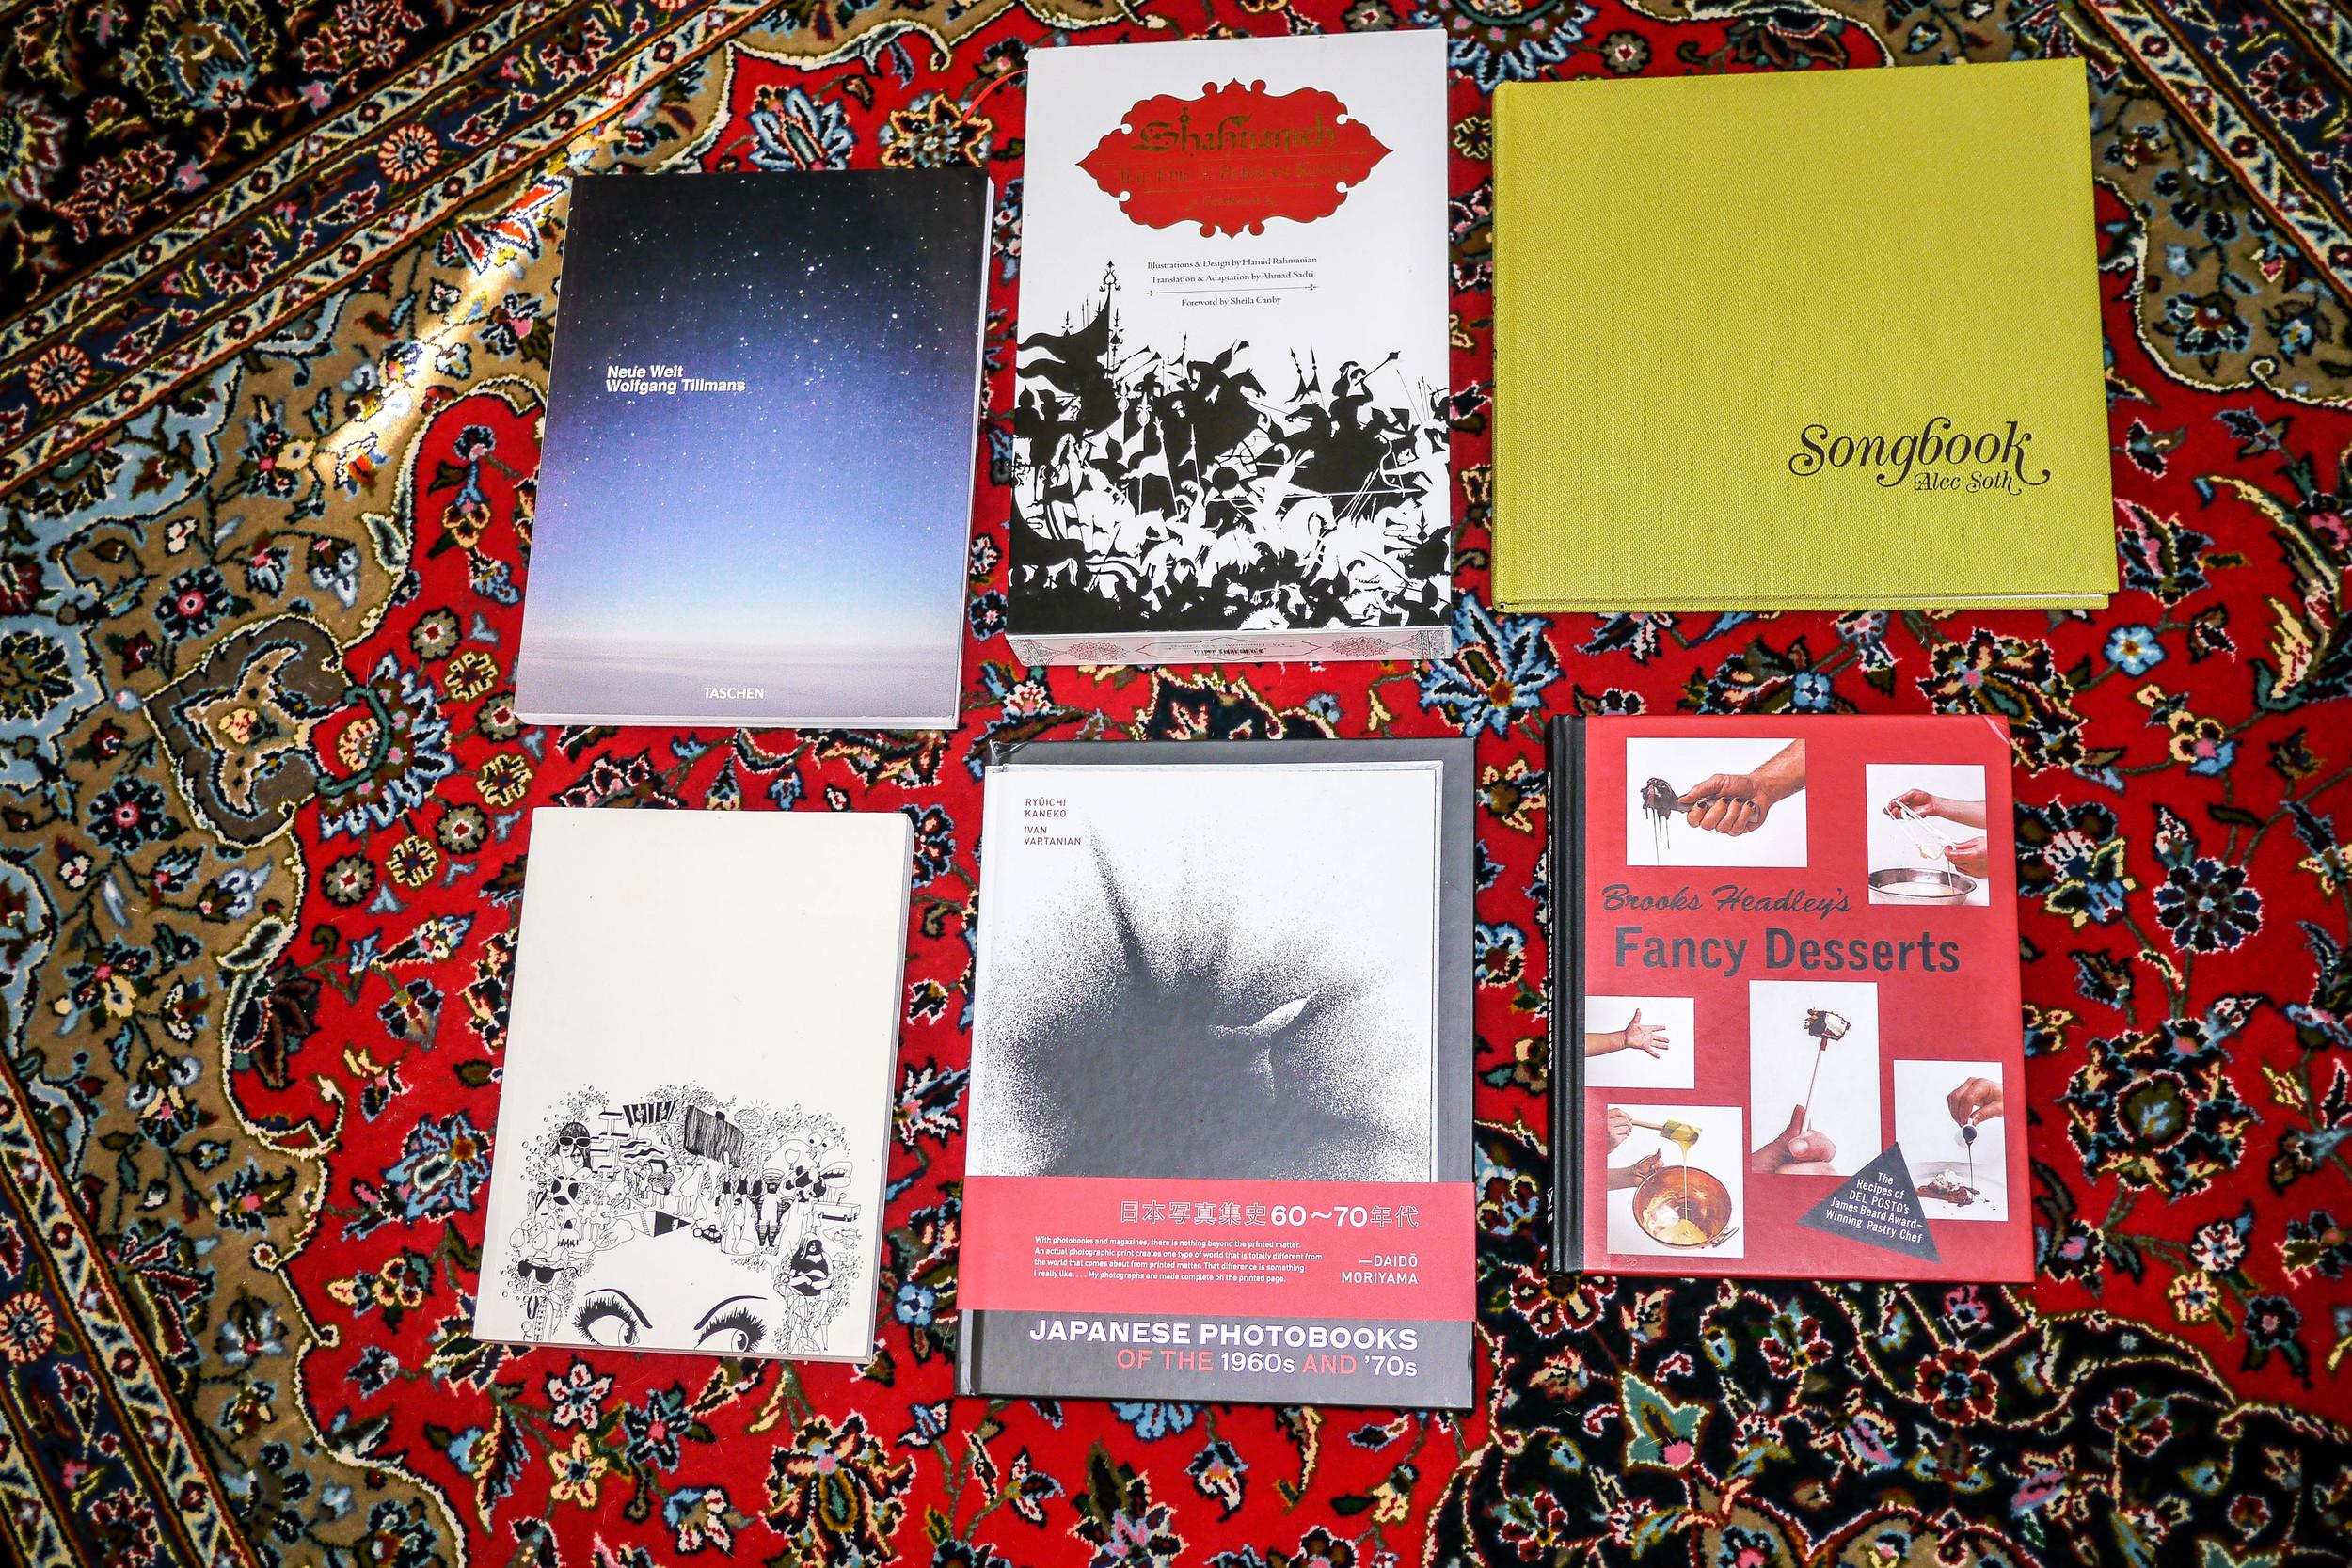 Sunny's Favorite Books